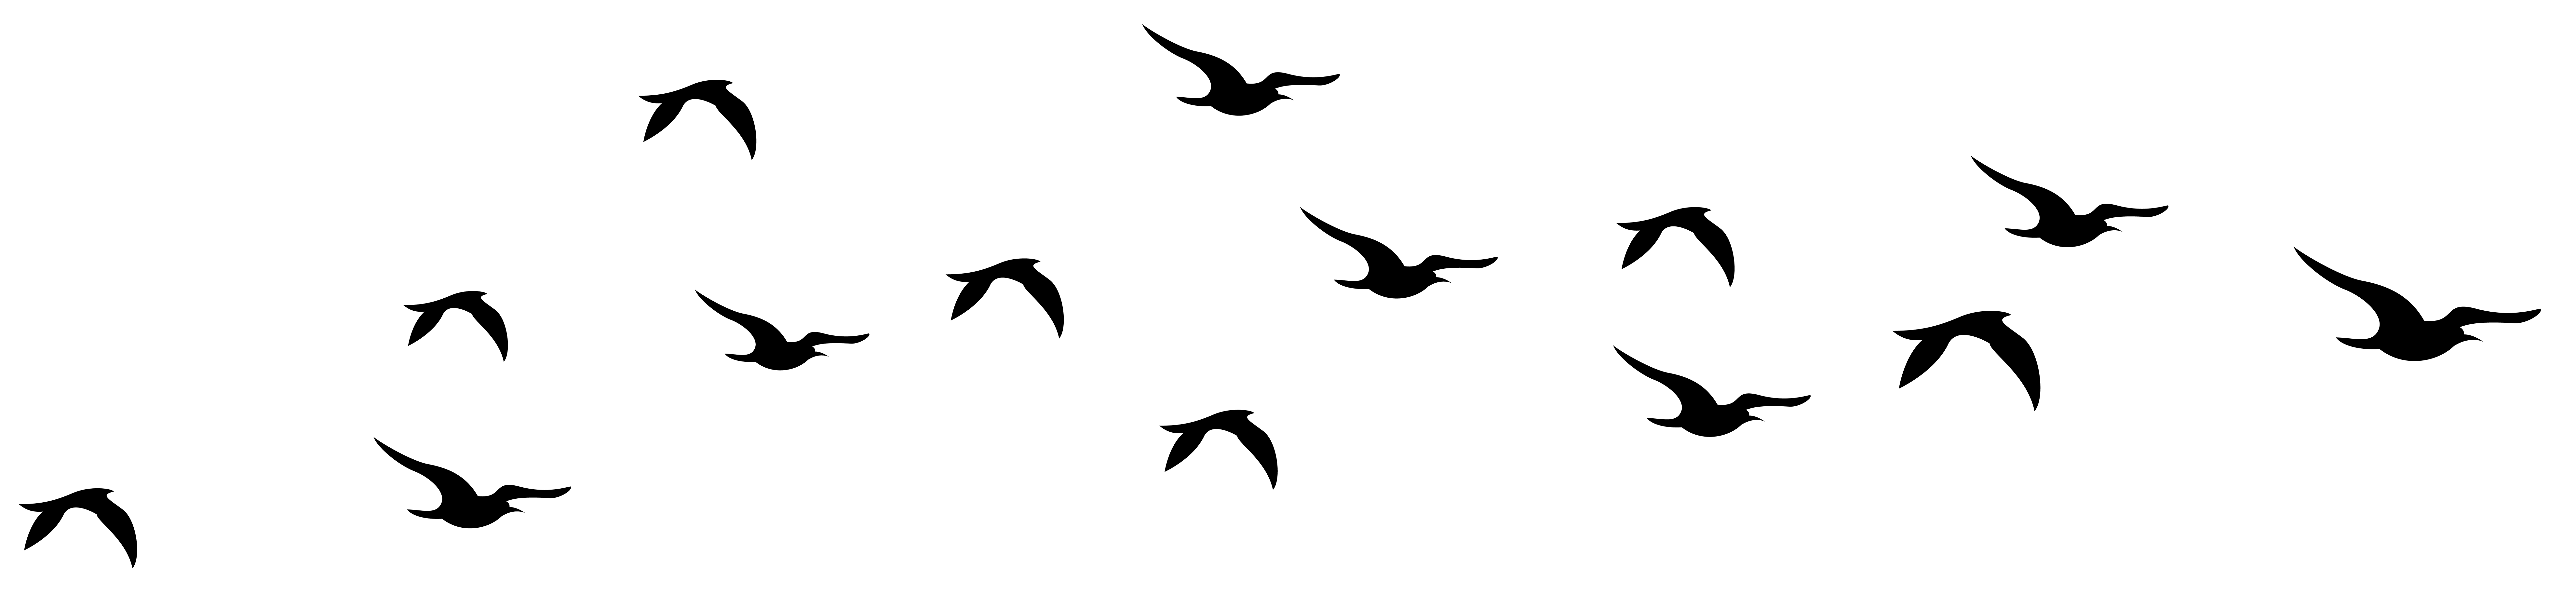 7919x1829 Gothic Tattoo Bird Png